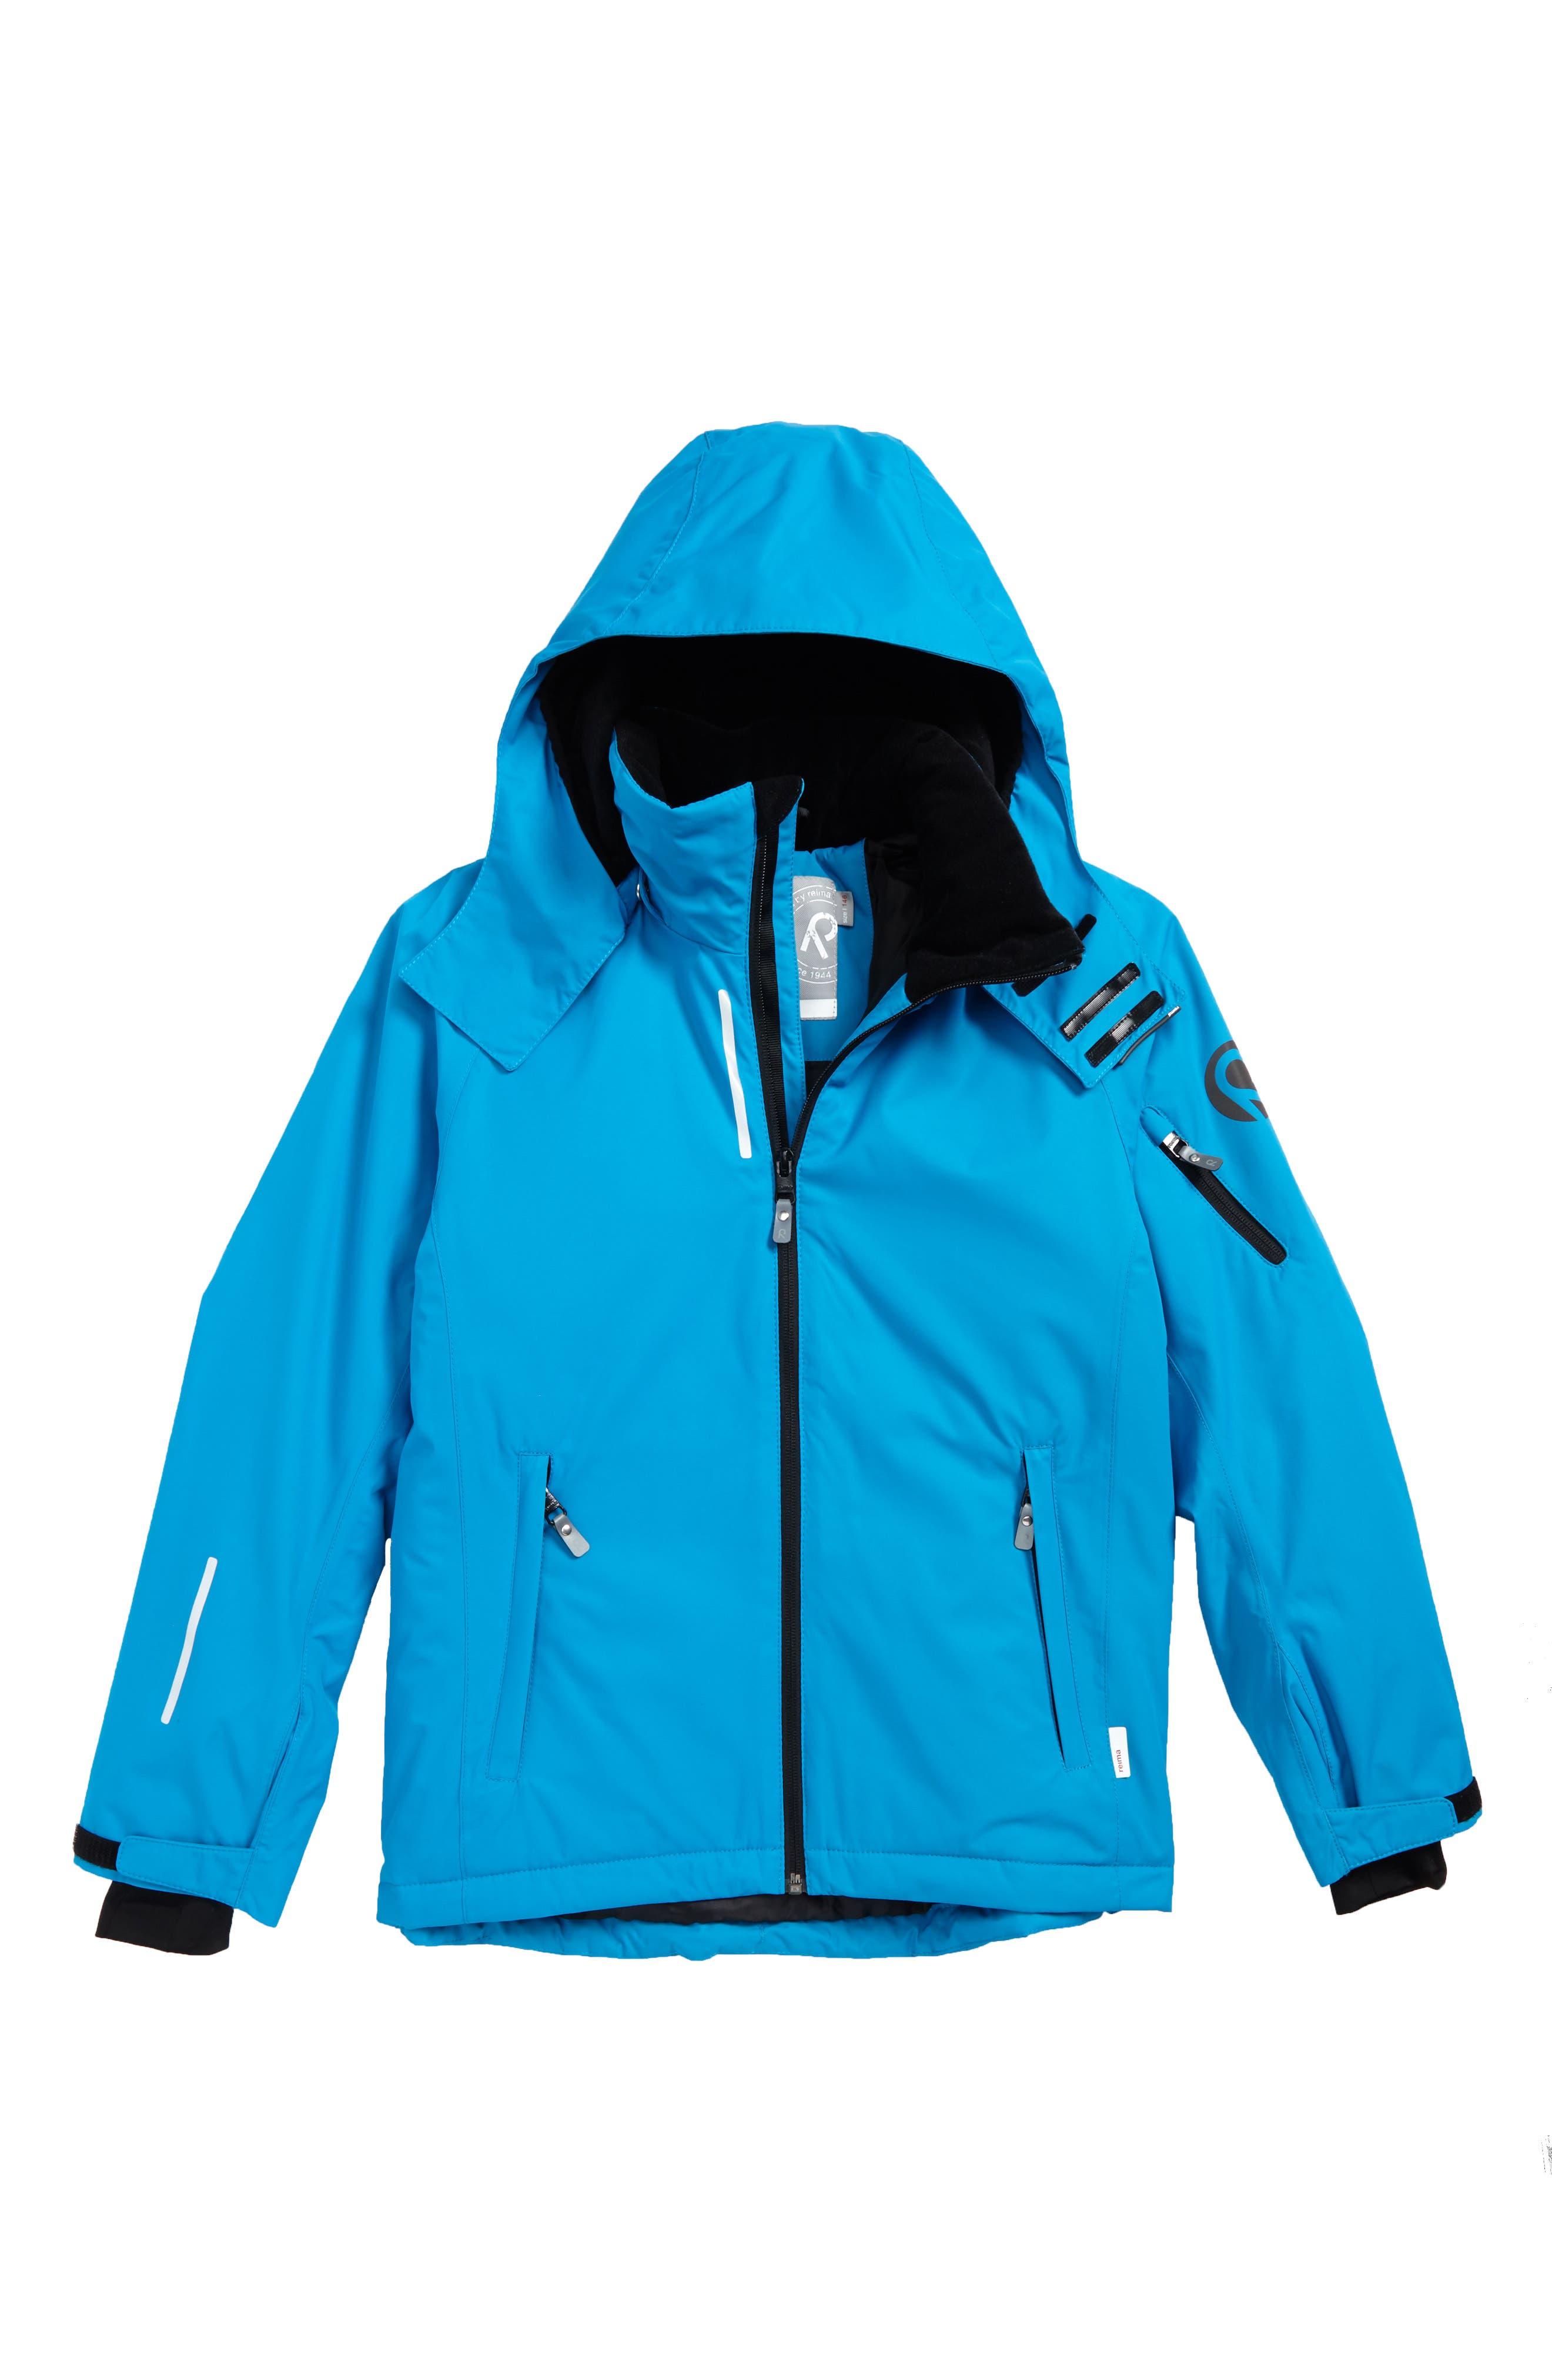 Reimatec<sup>®</sup> Detour Waterproof Hooded Jacket,                         Main,                         color,